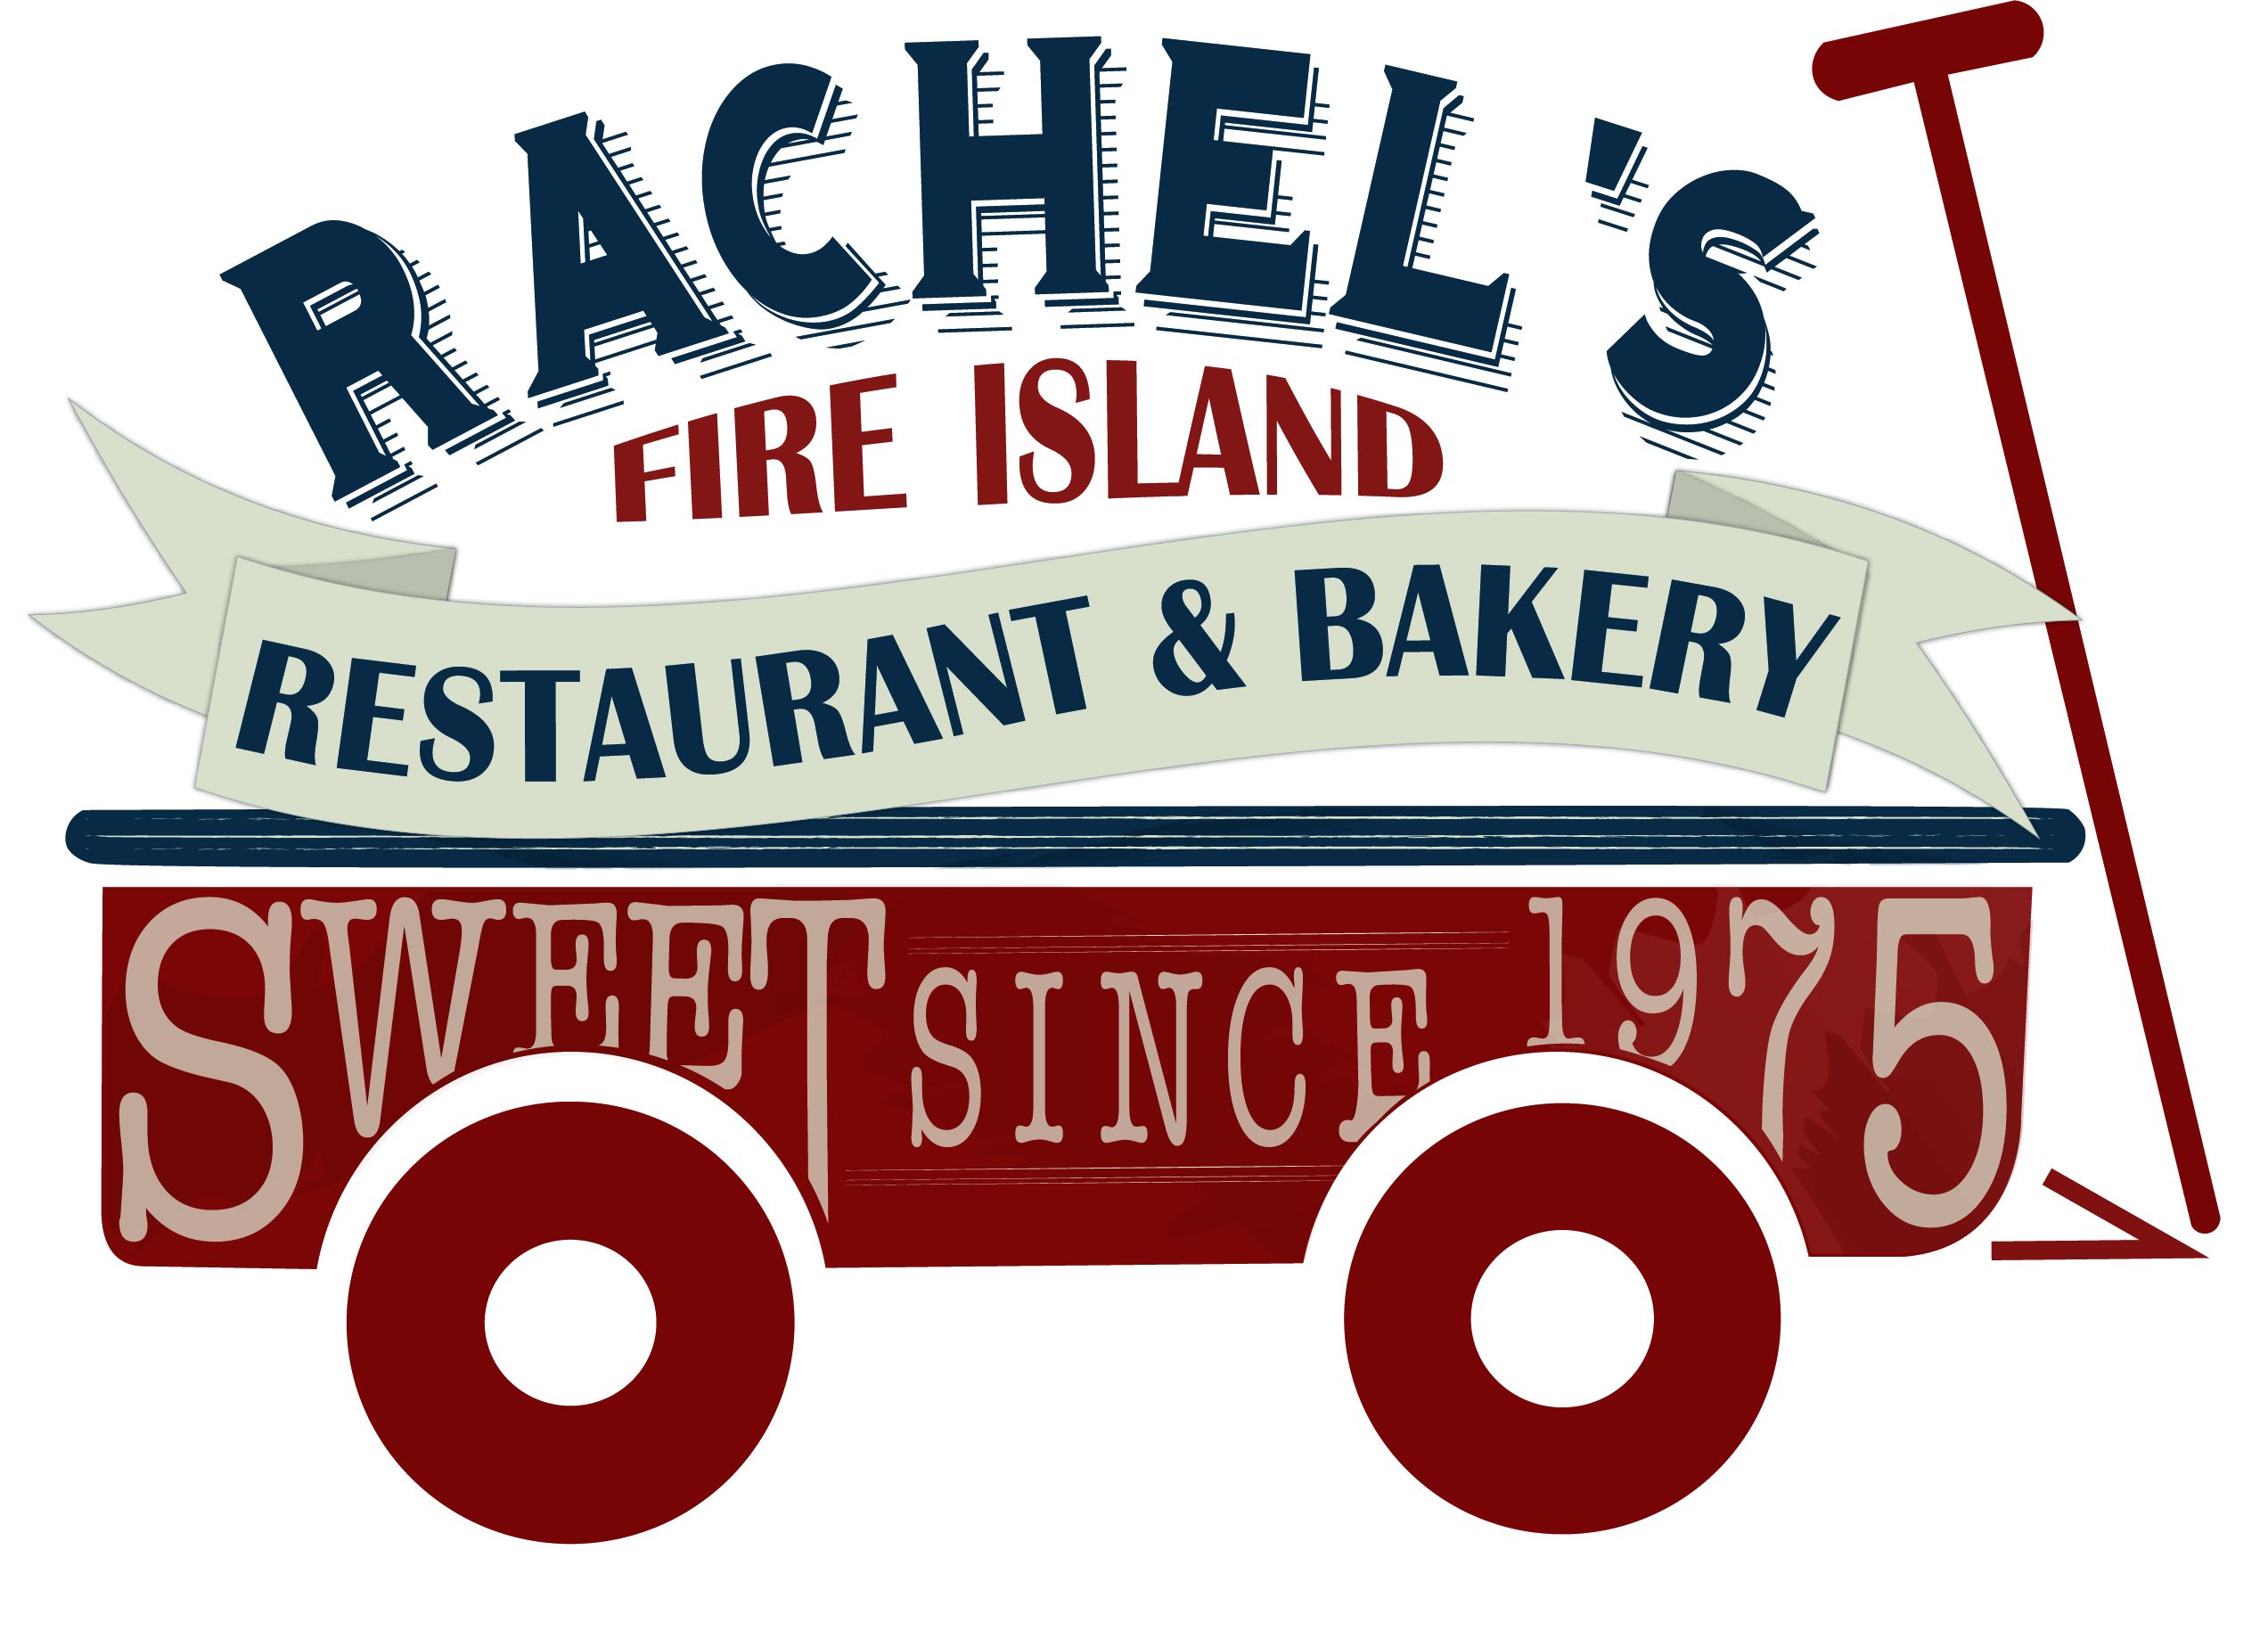 Rachel's Restaurant & Bakery